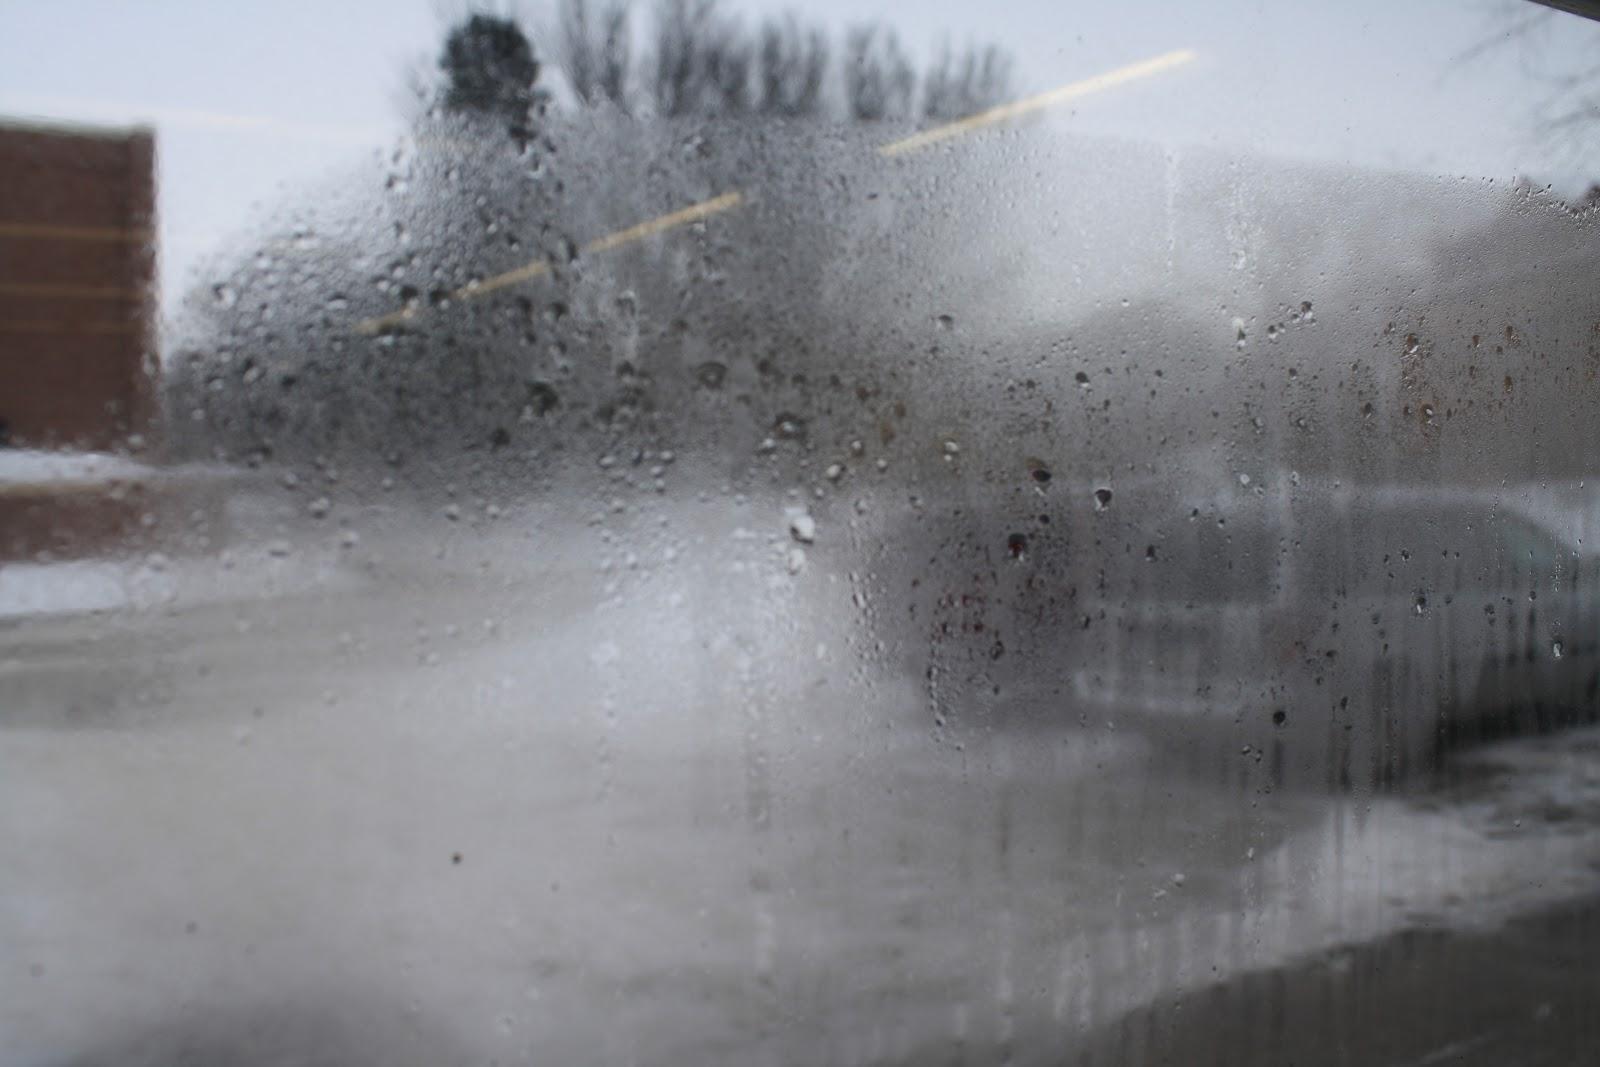 Adanac Blinds & Window Treatments: Controlling